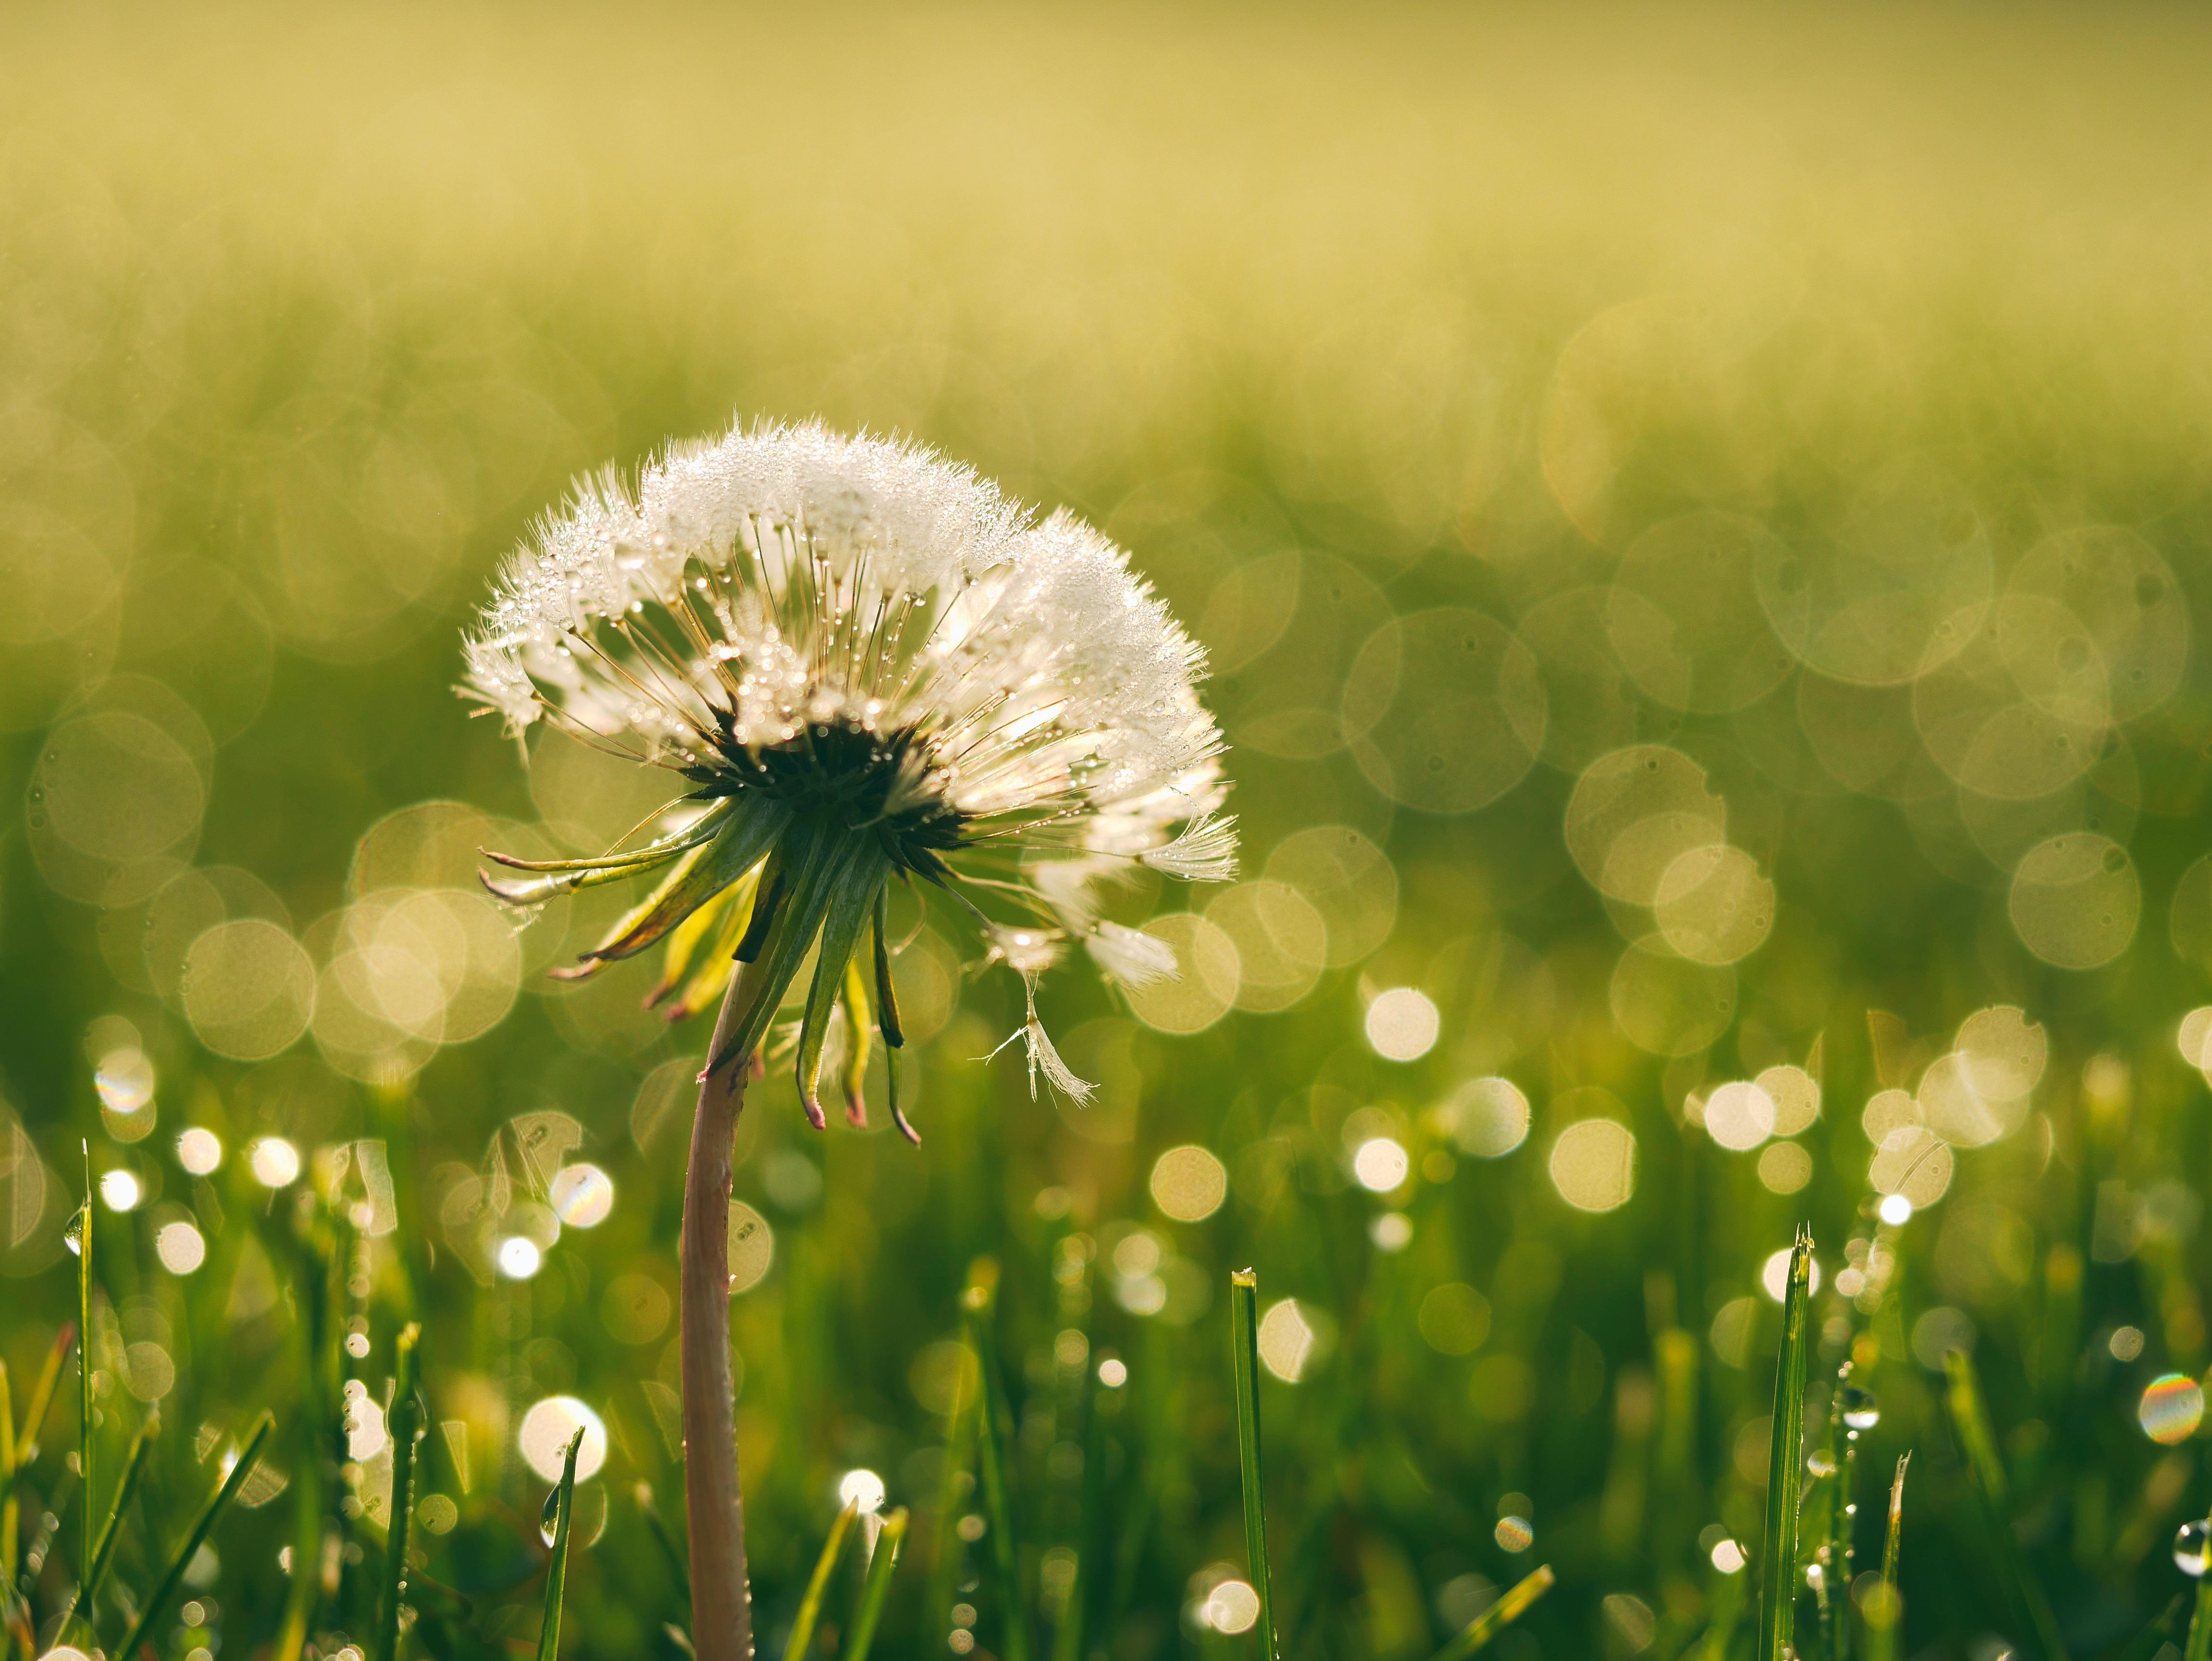 Citate Fotografie Free : 图片素材 性质 露 厂 领域 草坪 草地 蒲公英 草原 阳光 叶 花瓣 盛开 湿 绿色